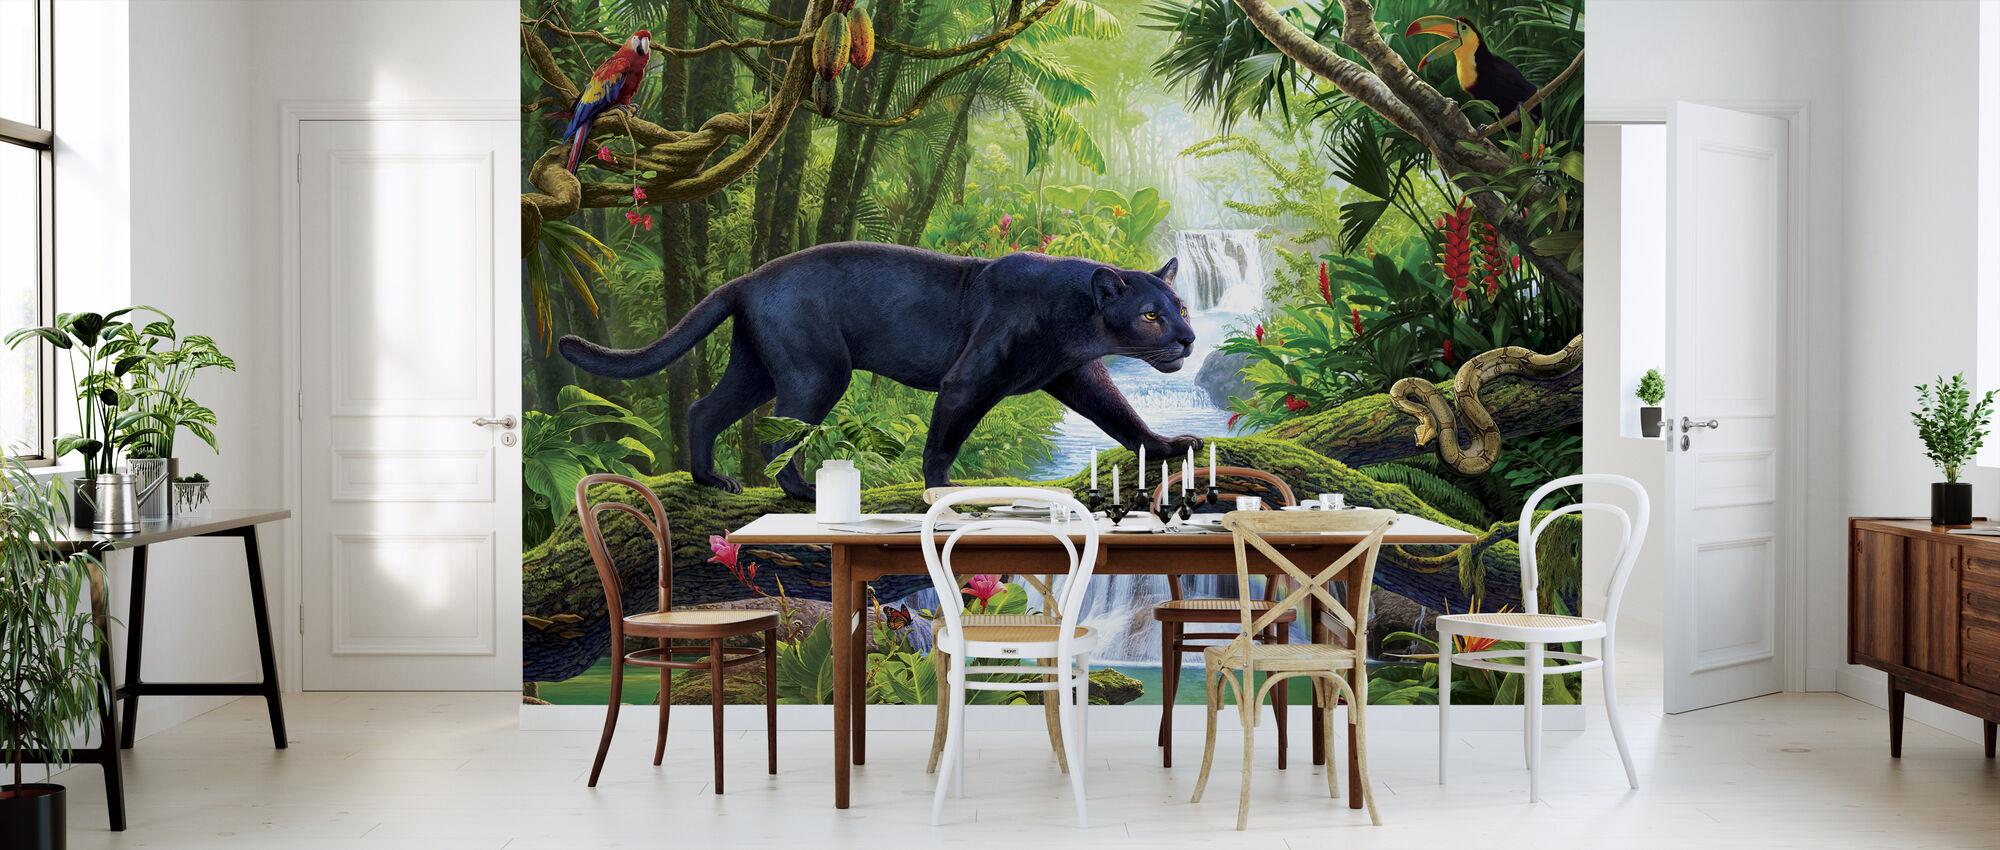 Pantera en la selva - Papel pintado - Cocina